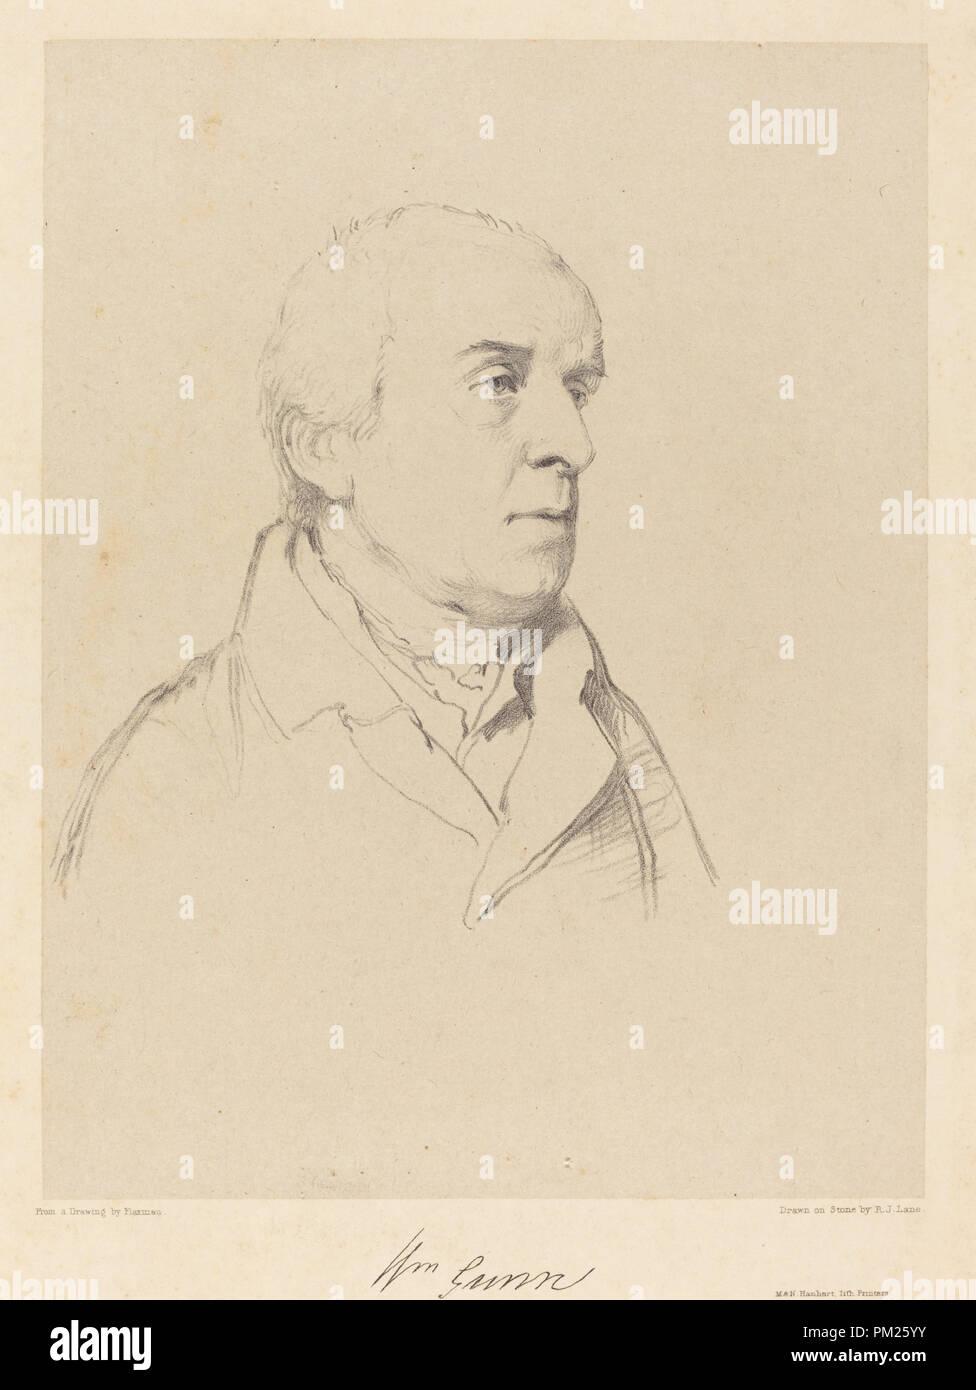 William Gunn. Medium: lithograph on papier colle. Museum: National Gallery of Art, Washington DC. Author: Richard James Lane after John Flaxman. - Stock Image